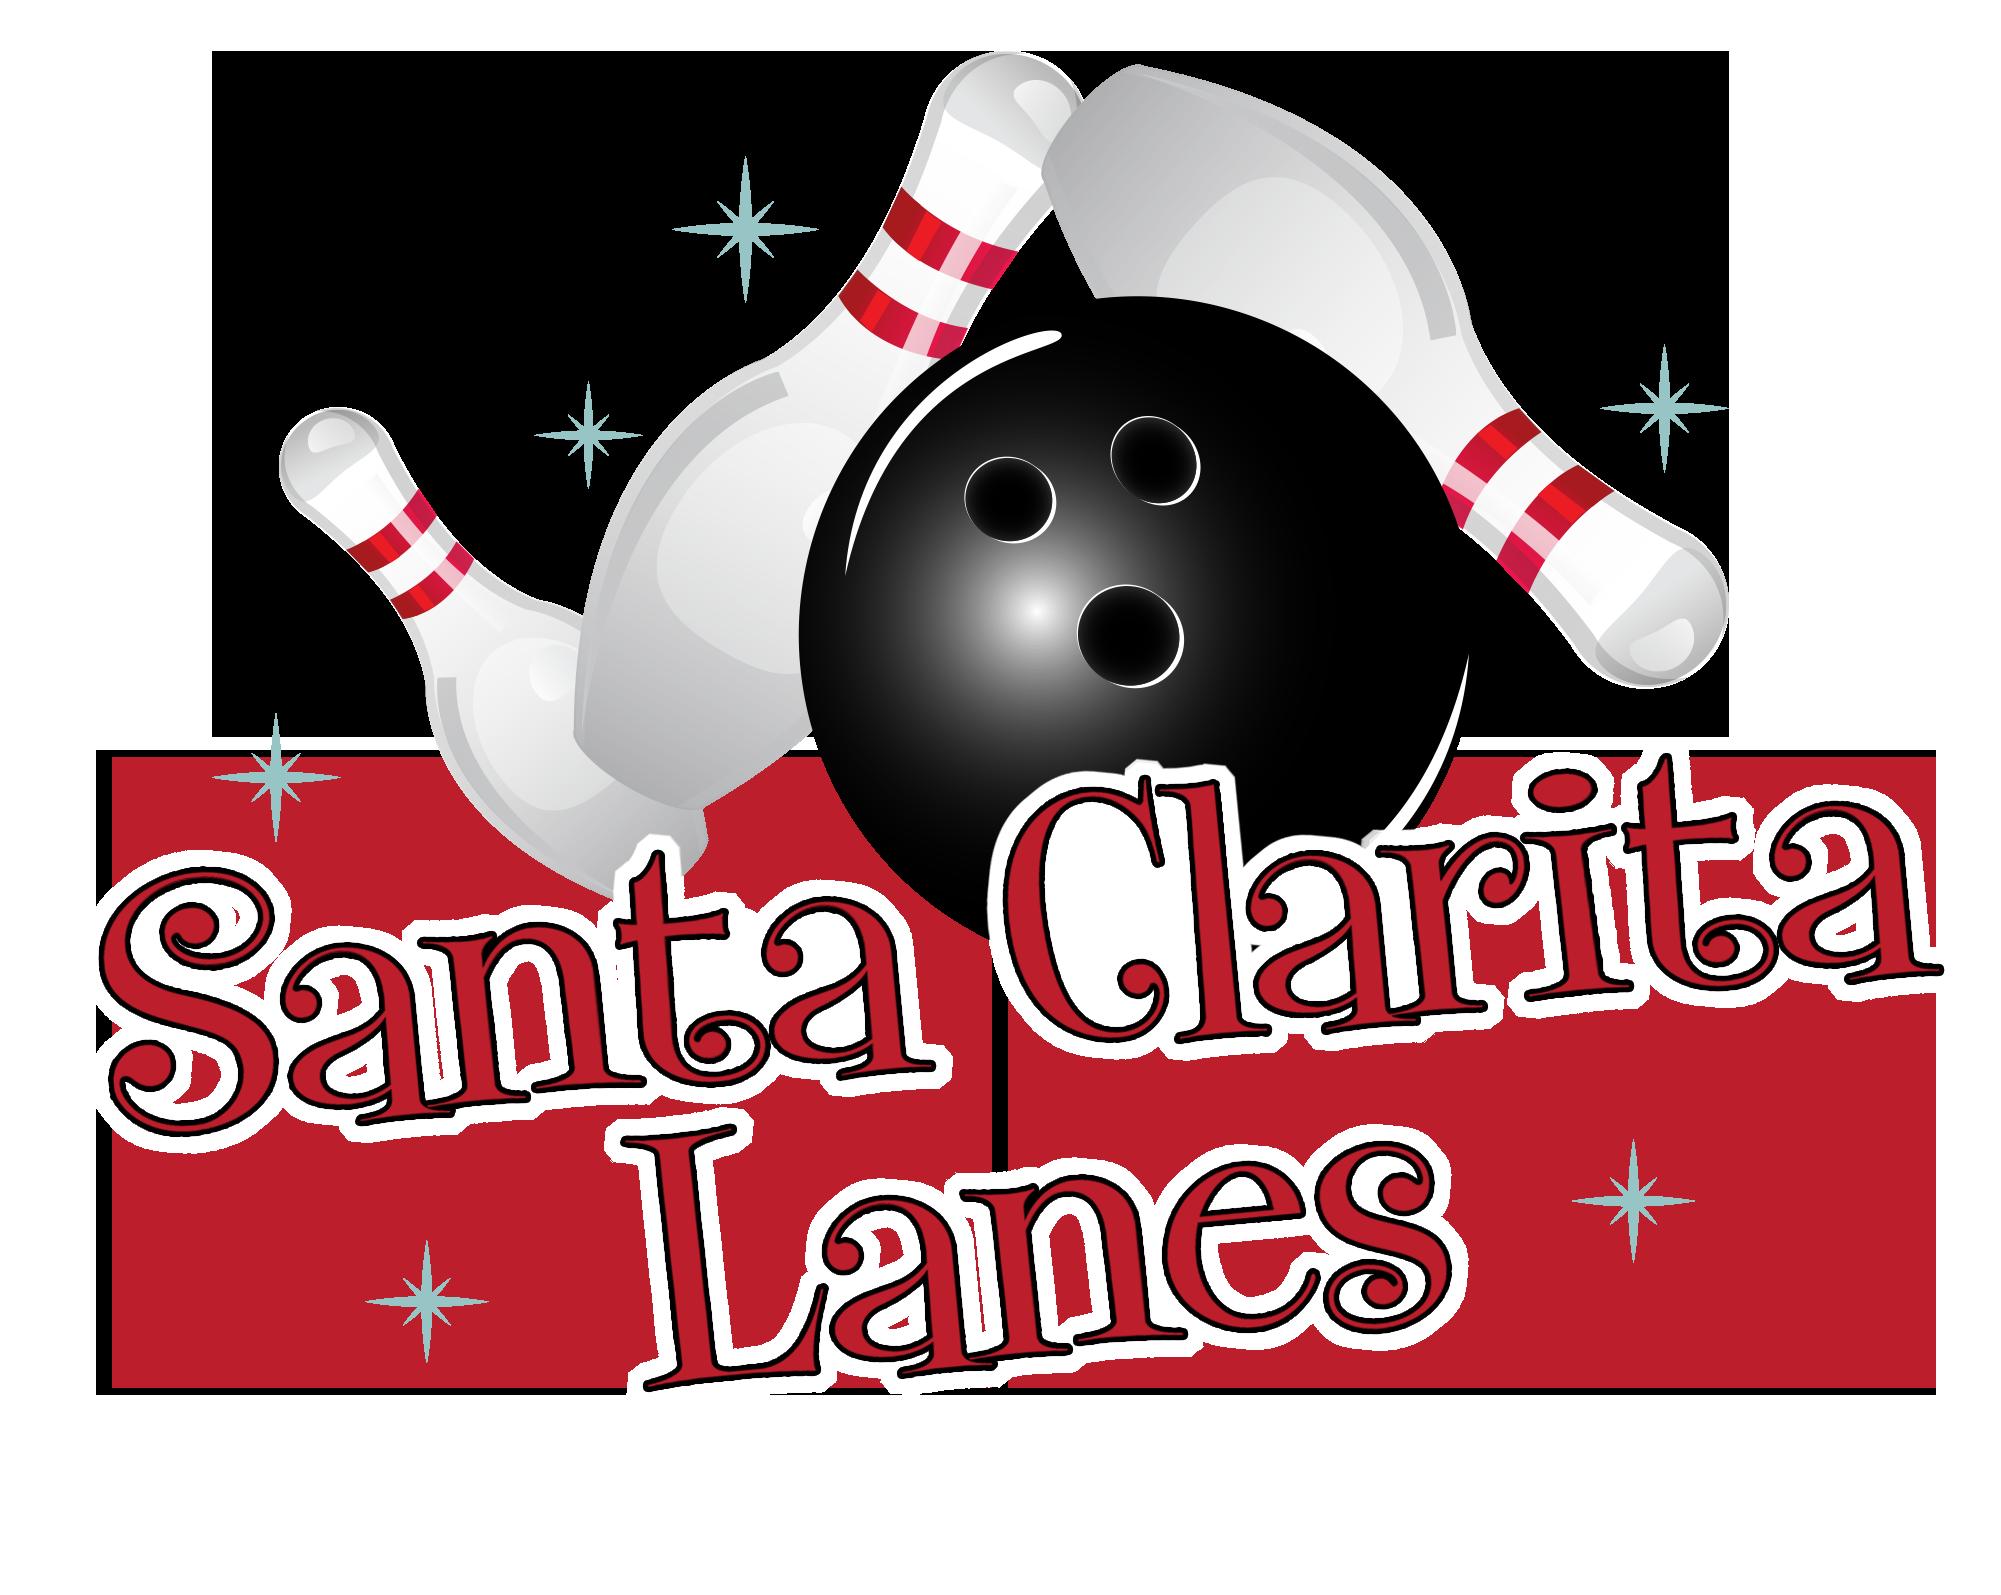 Santa Clarita Lanes logo